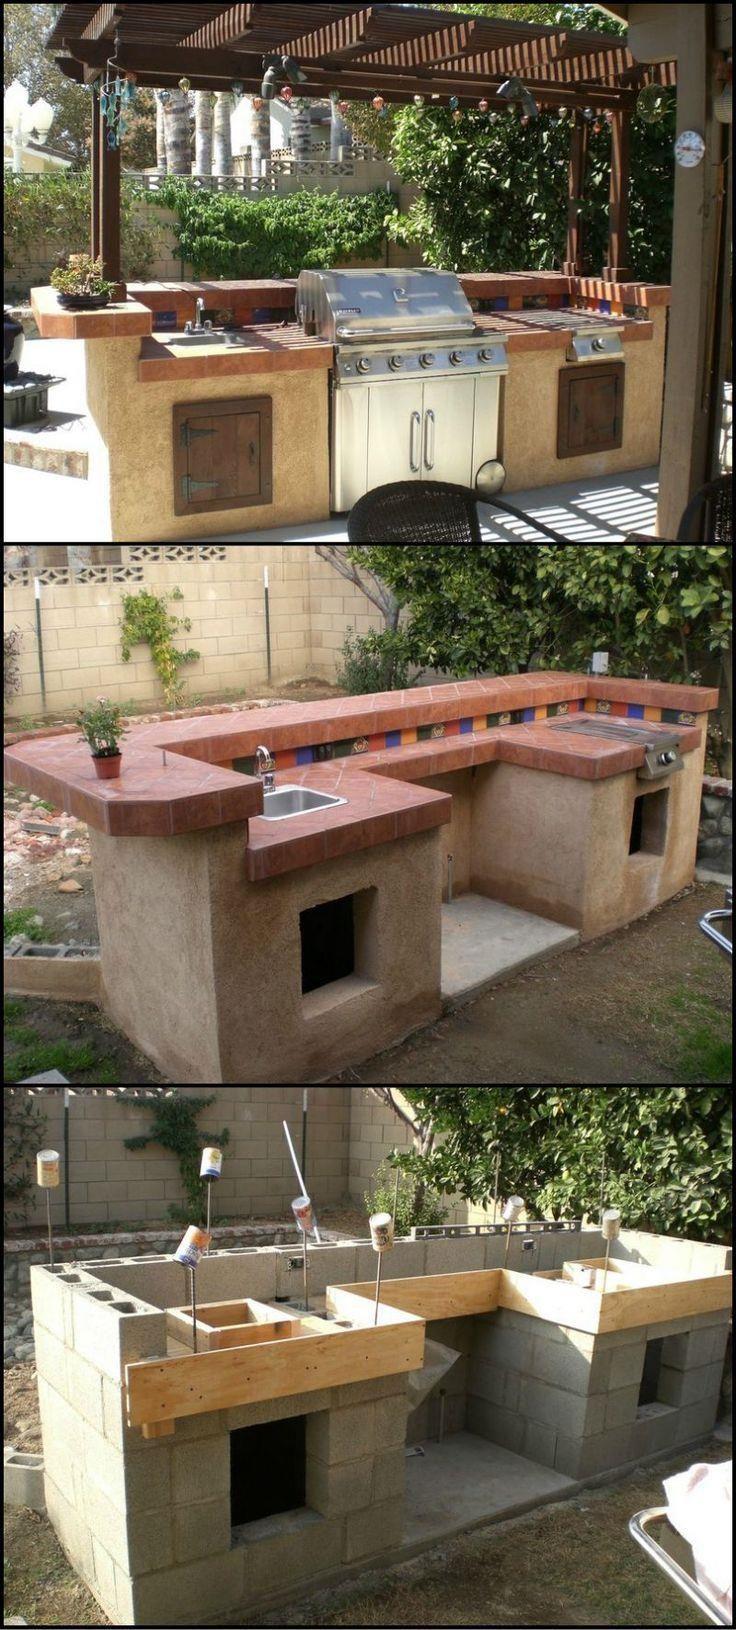 Best DIY cinder block fire pit ideas design! cinder block ... on Cinder Block Fireplace Diy id=52265